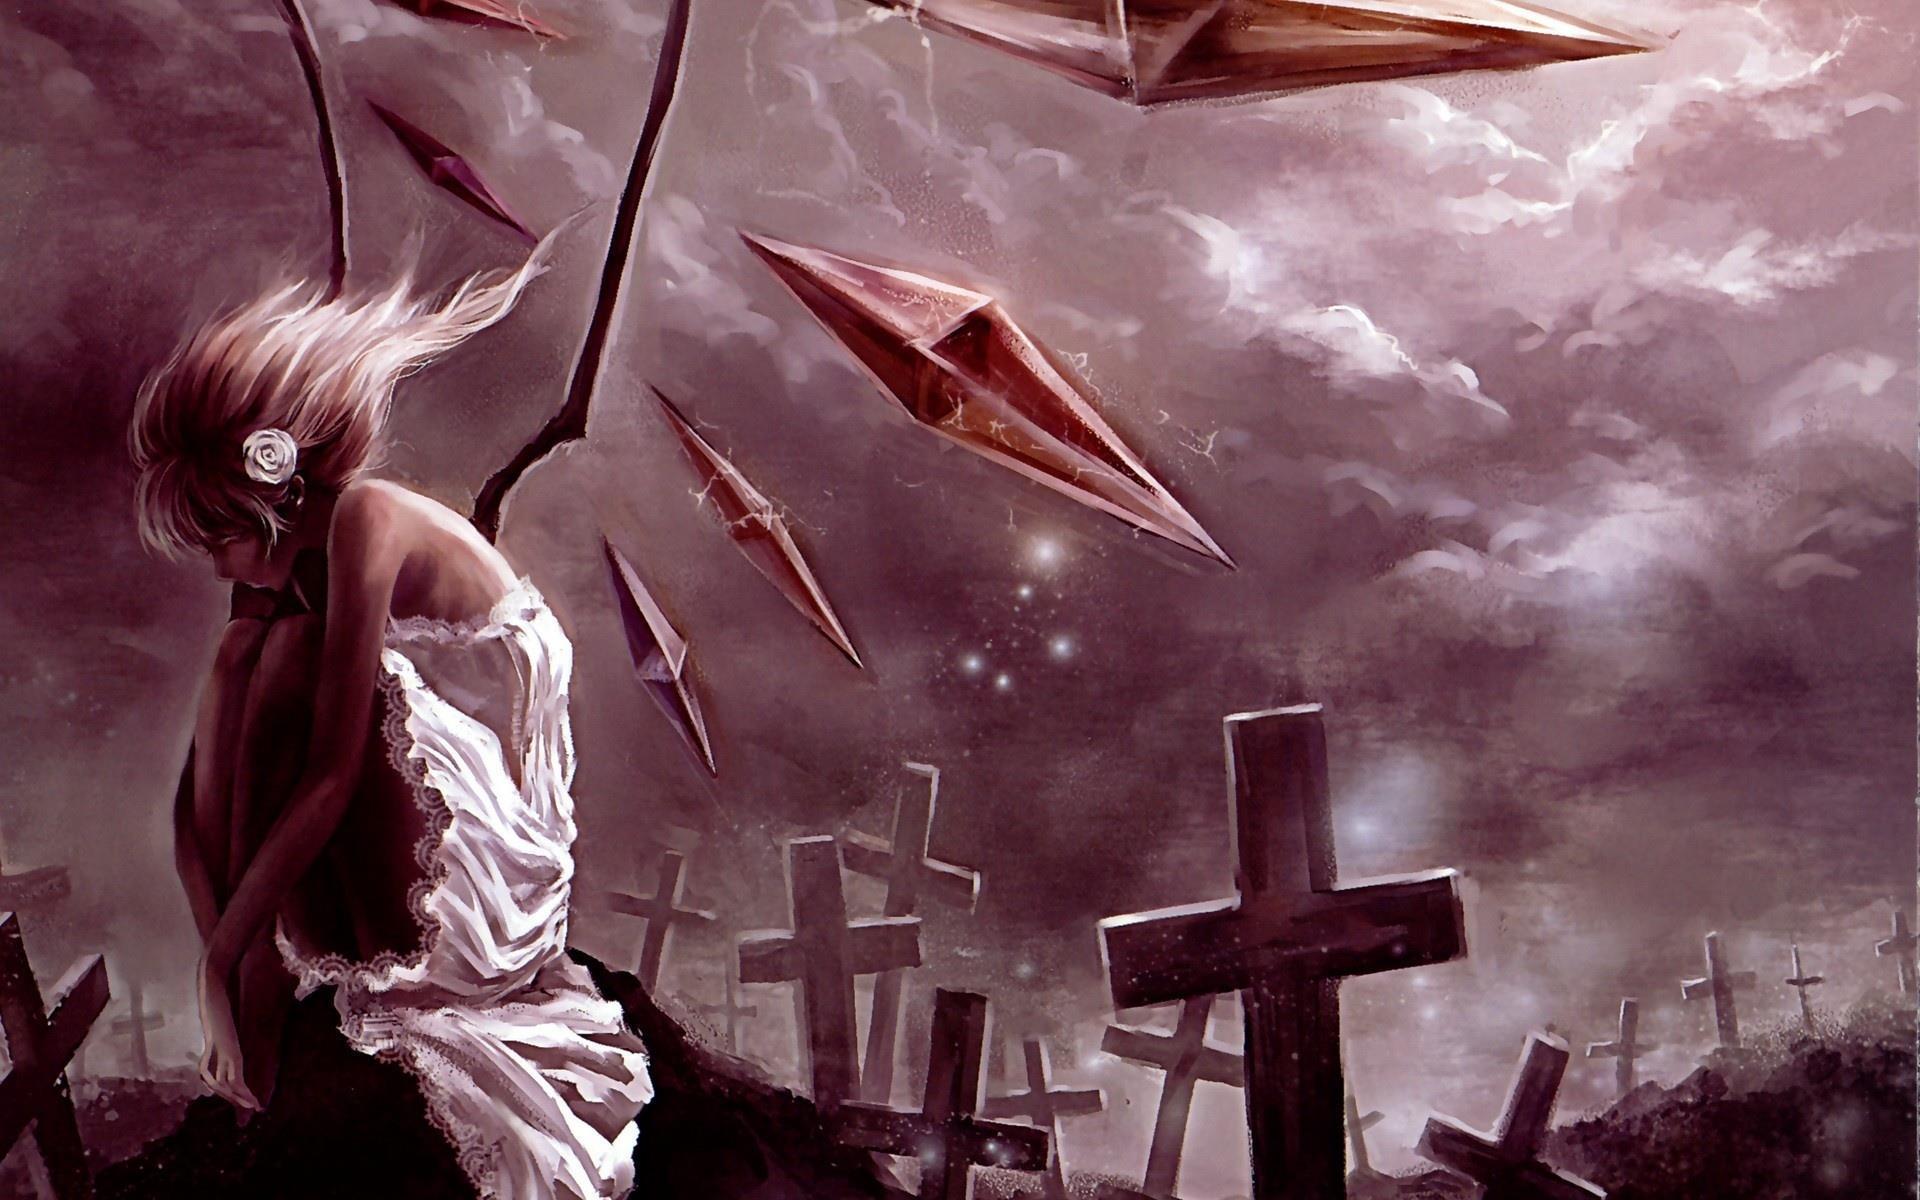 telecharger_heroines-manga_HD_1